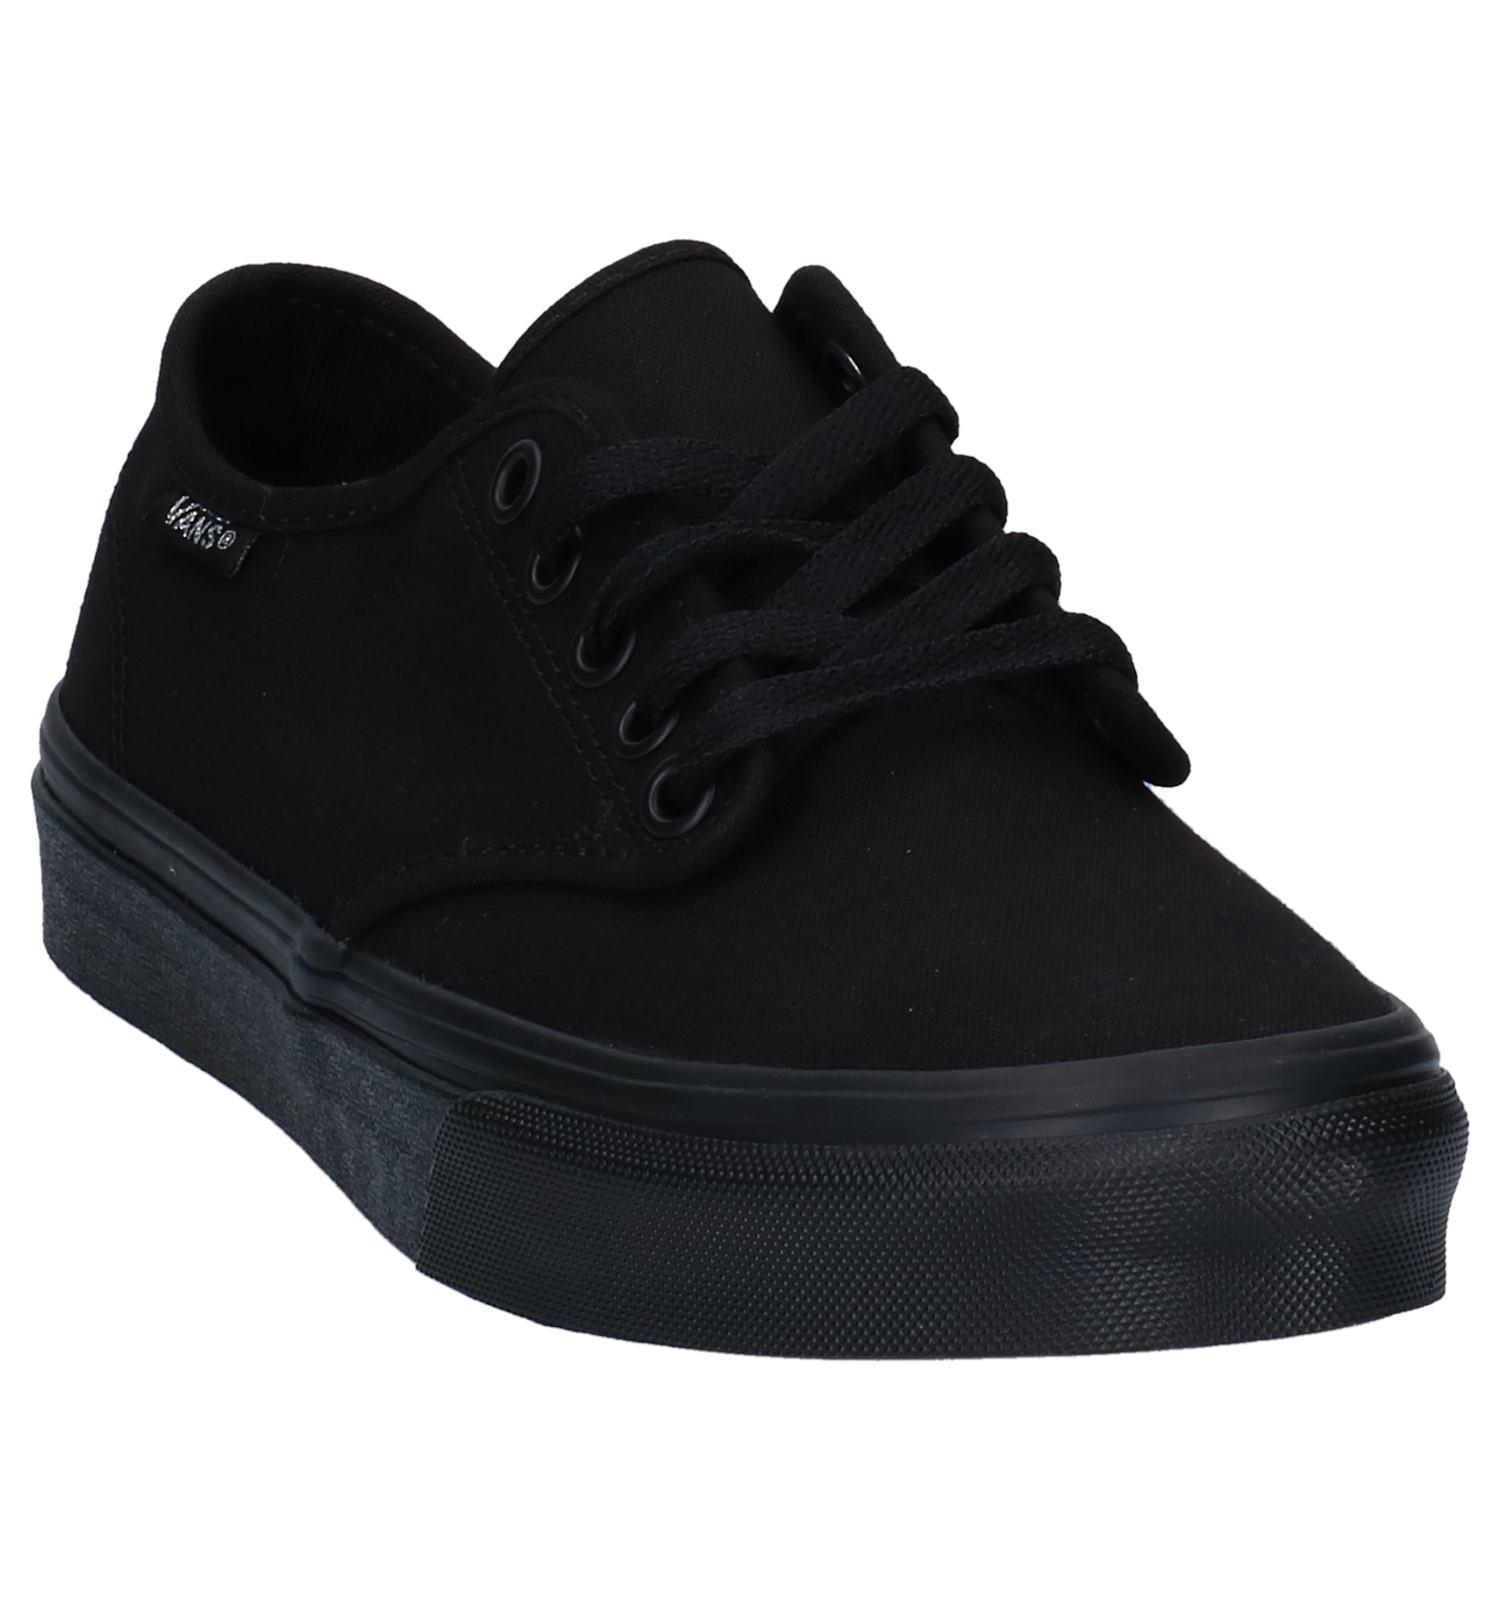 Chaussures populaires Vans Camden Stripe Baskets Femme